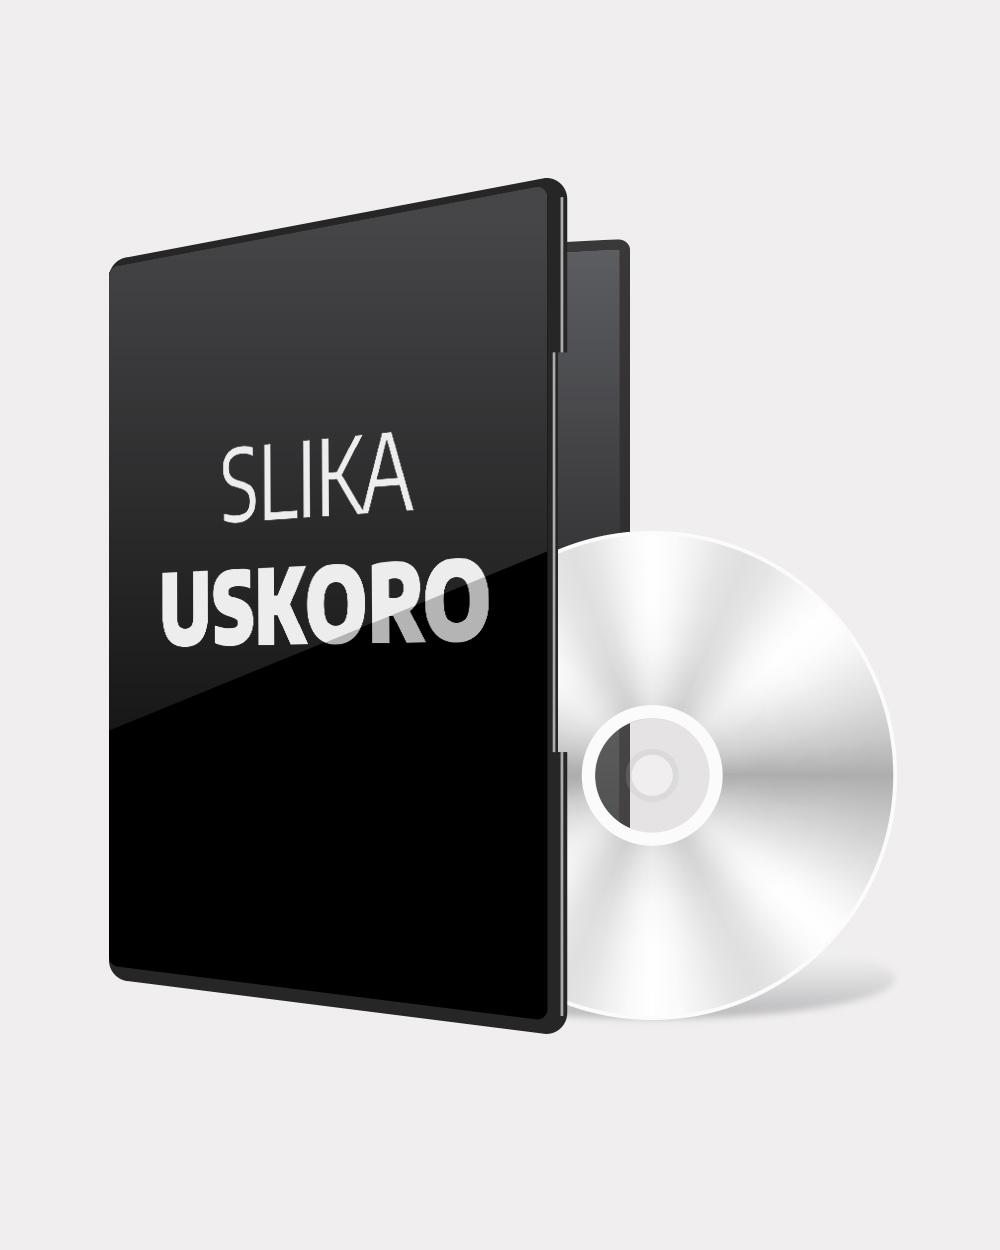 PS4 Kingdom Hearts 3 - Deluxe Edition